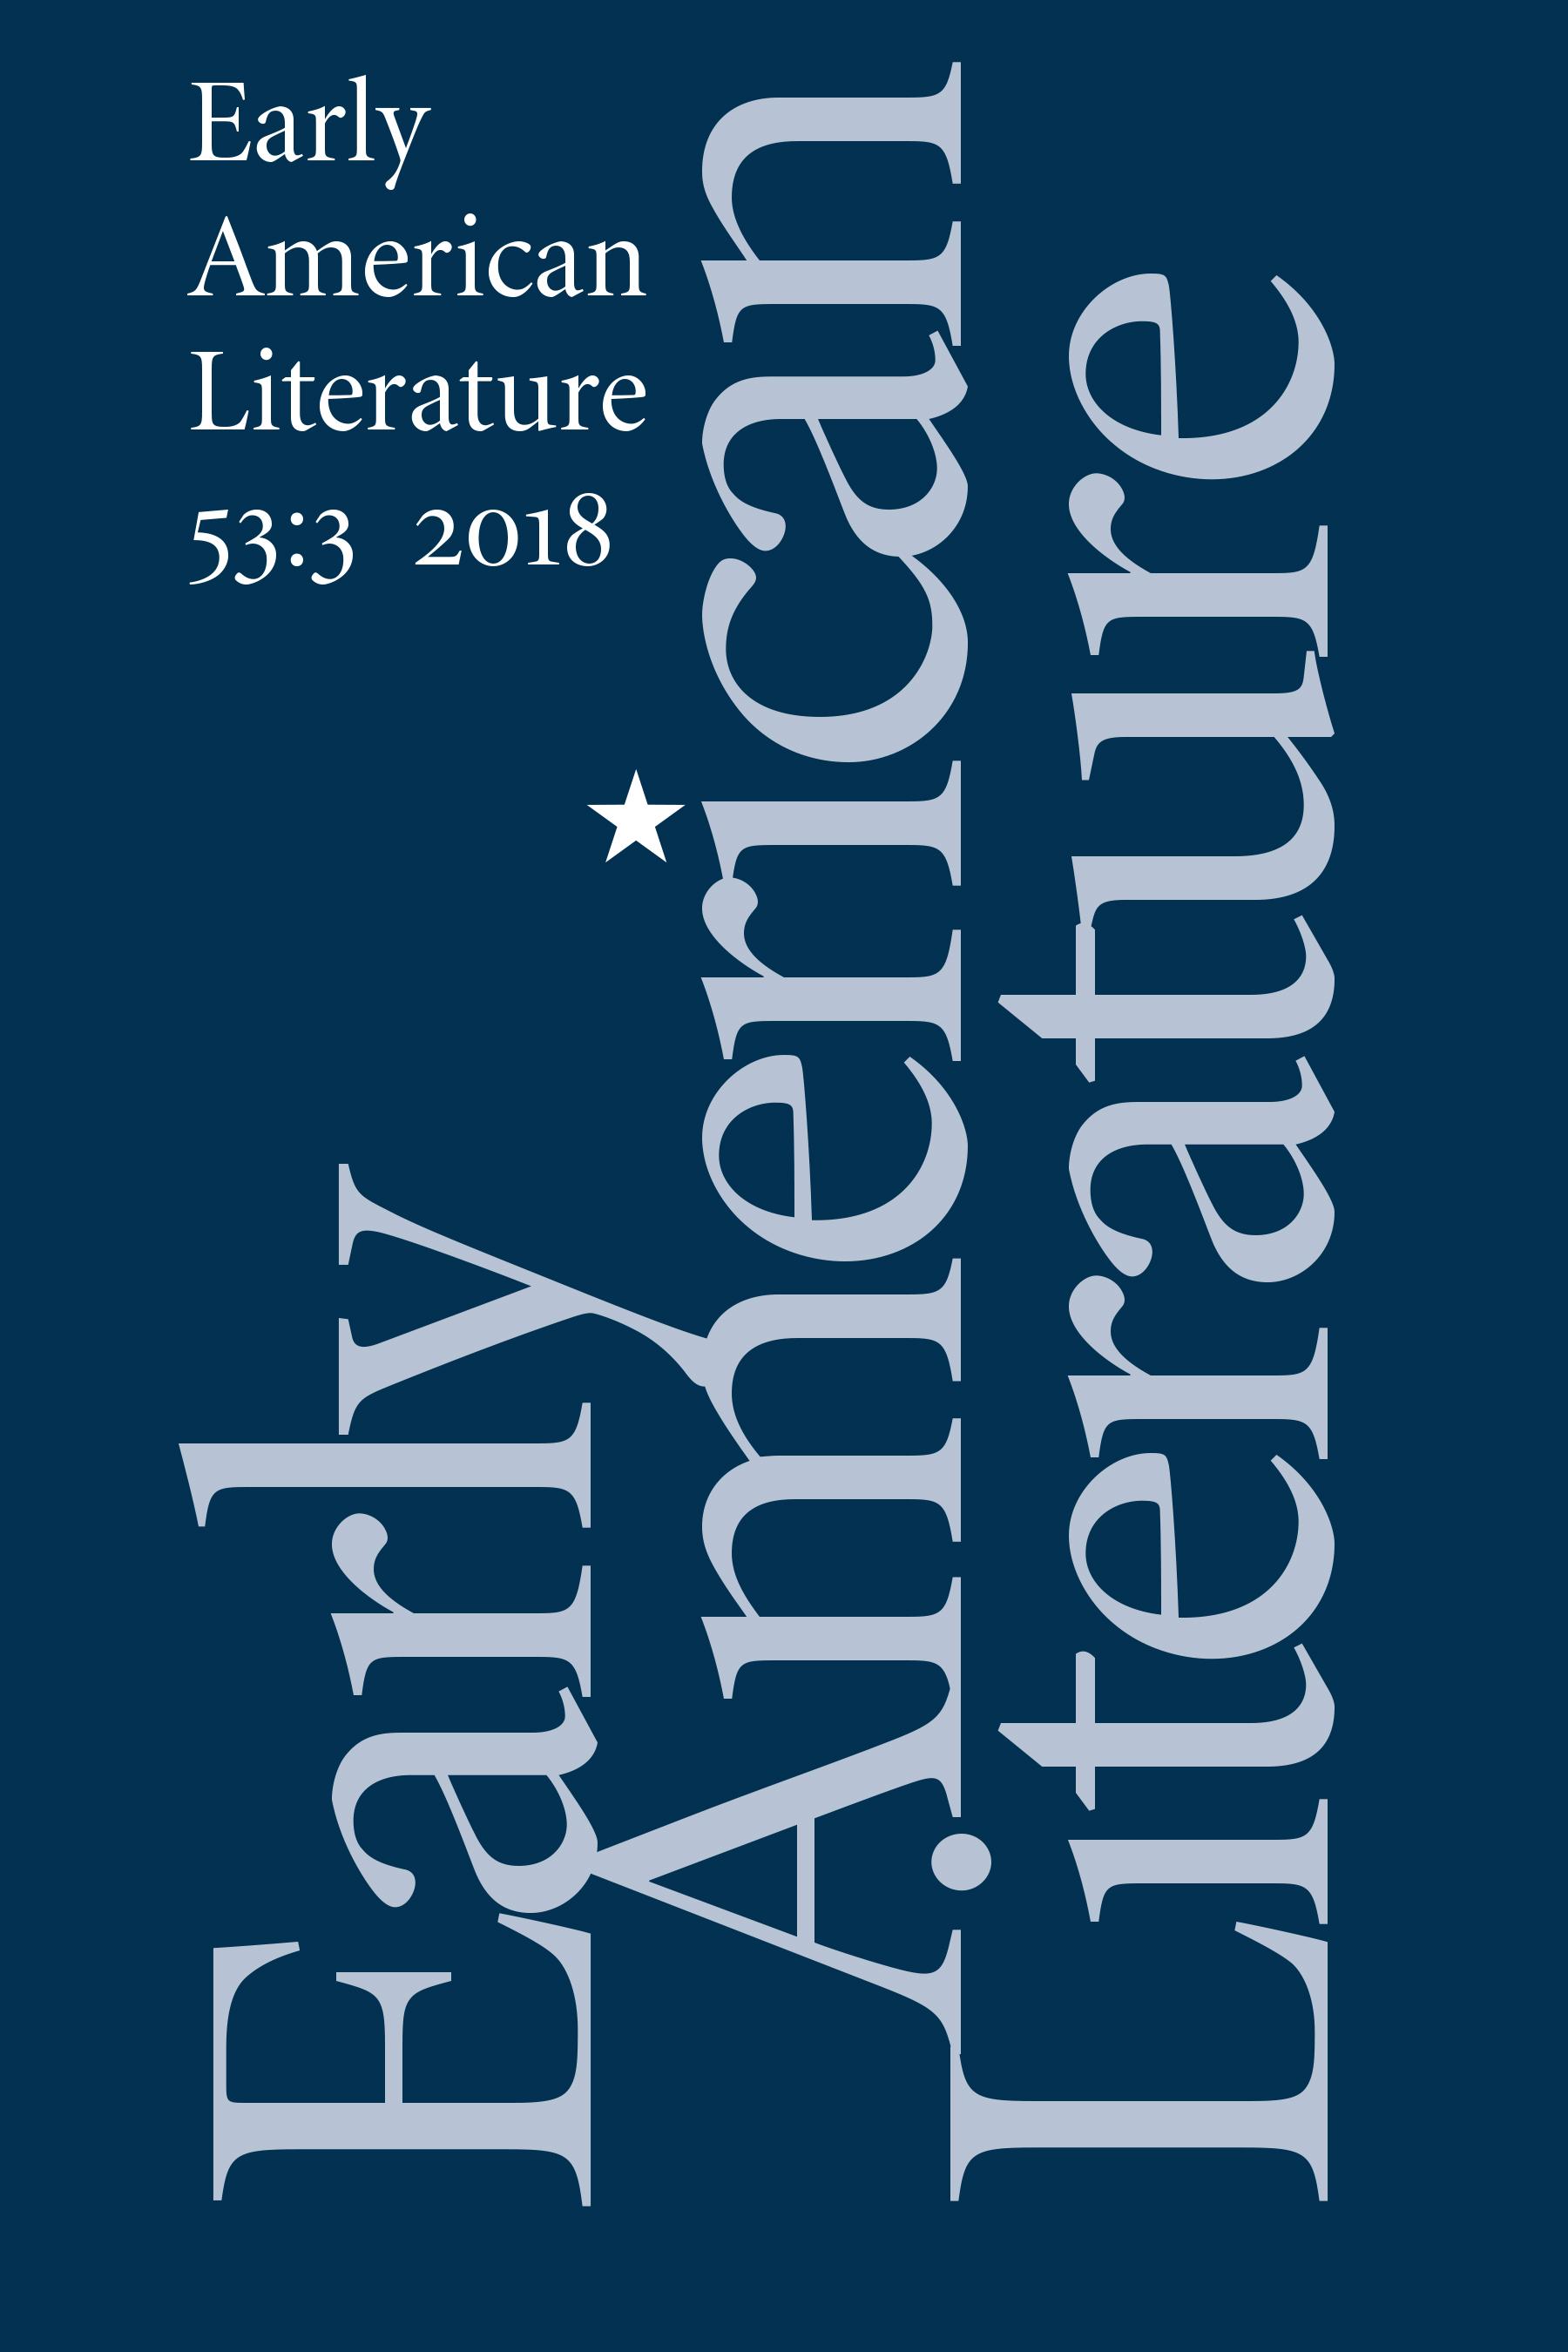 Early American Literature, vol. 53 no. 3, 2018